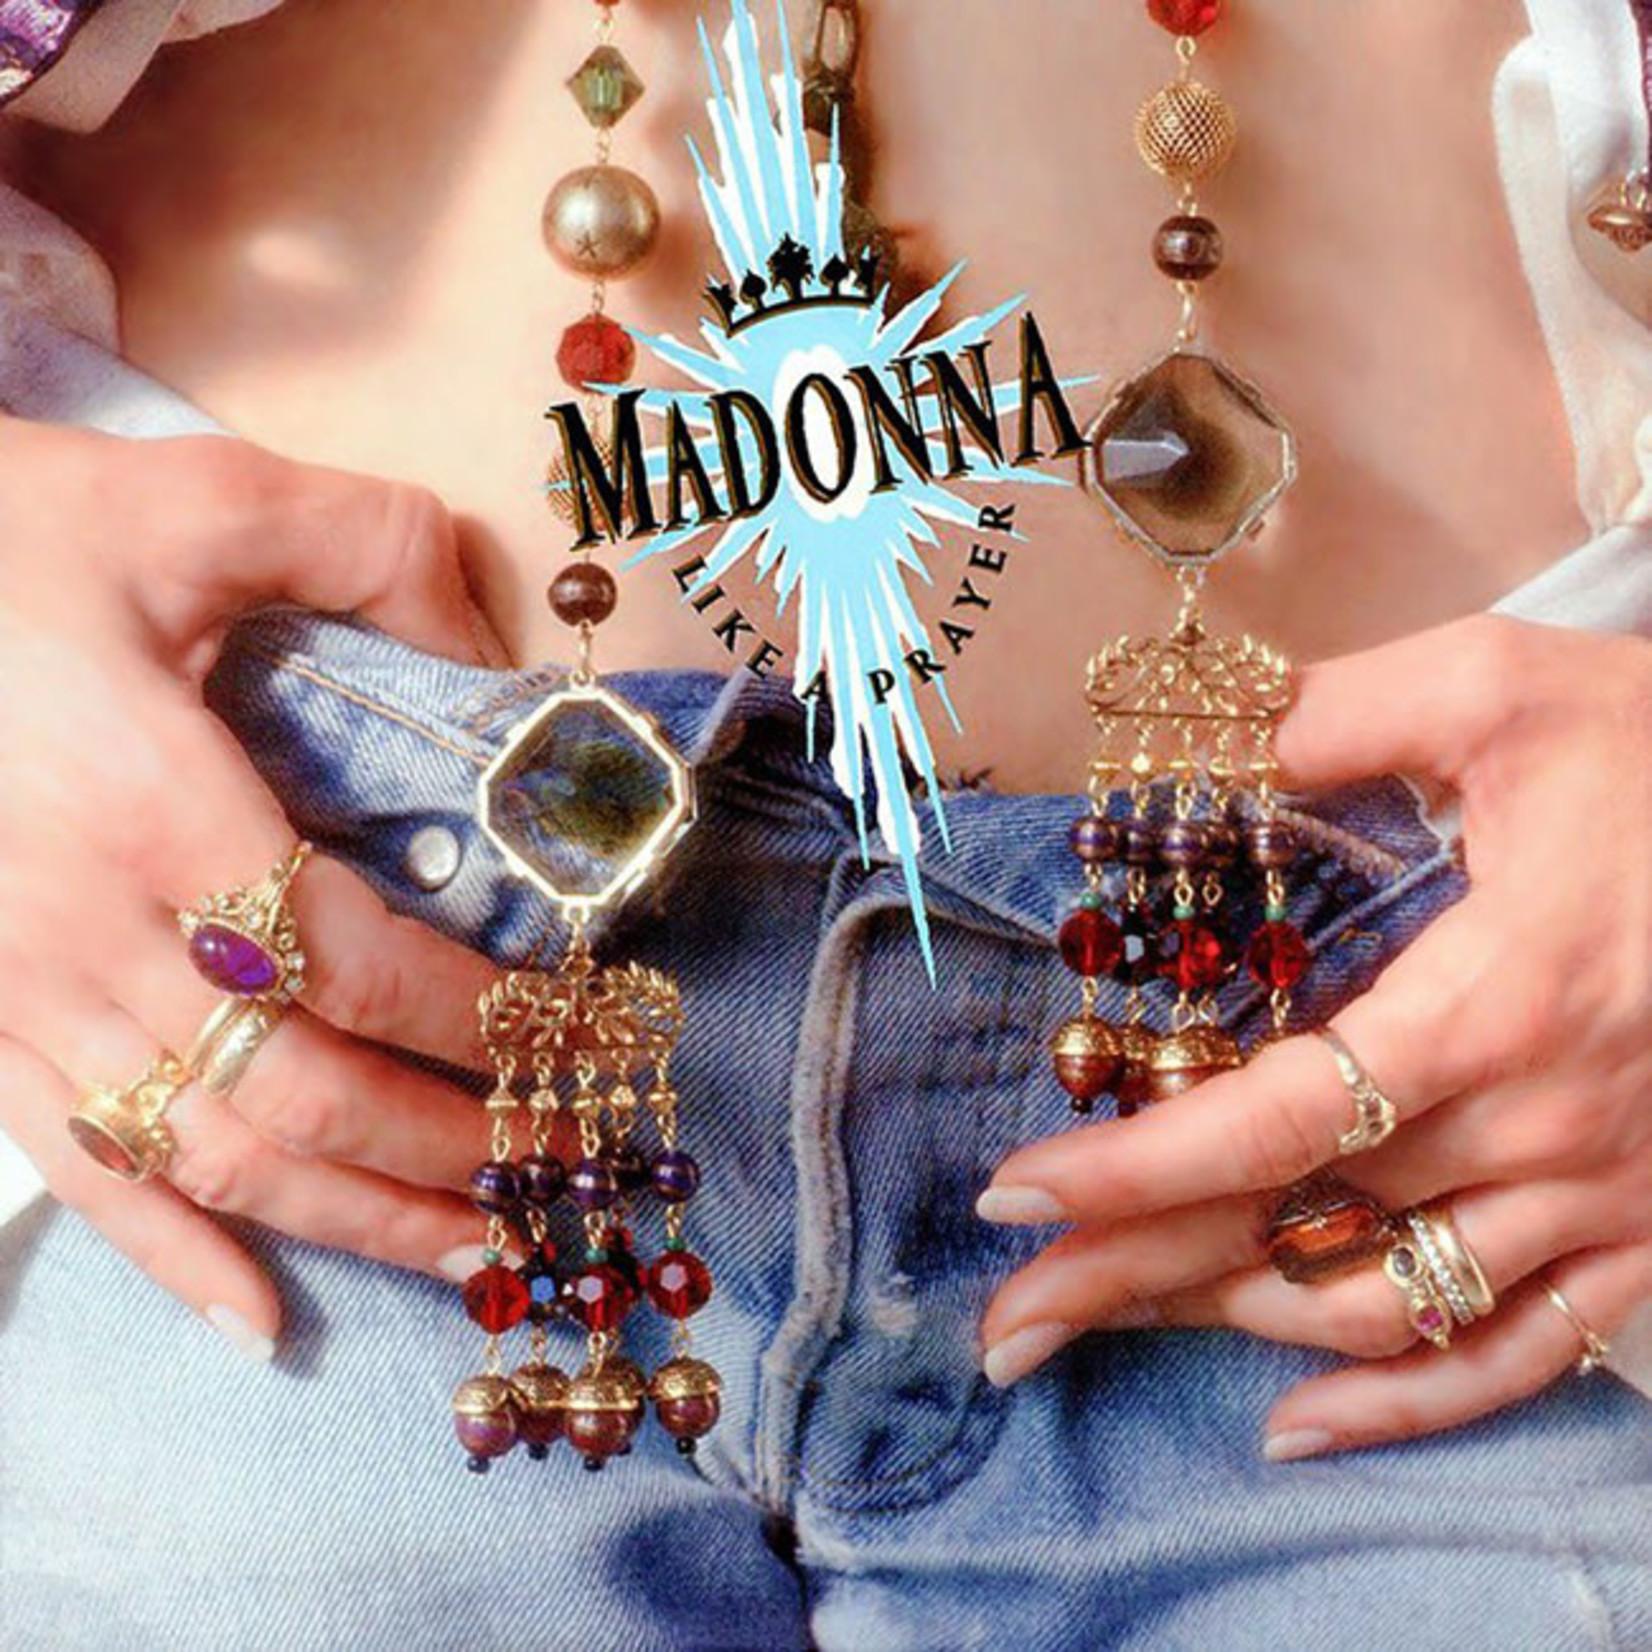 [New] Madonna: Like A Prayer